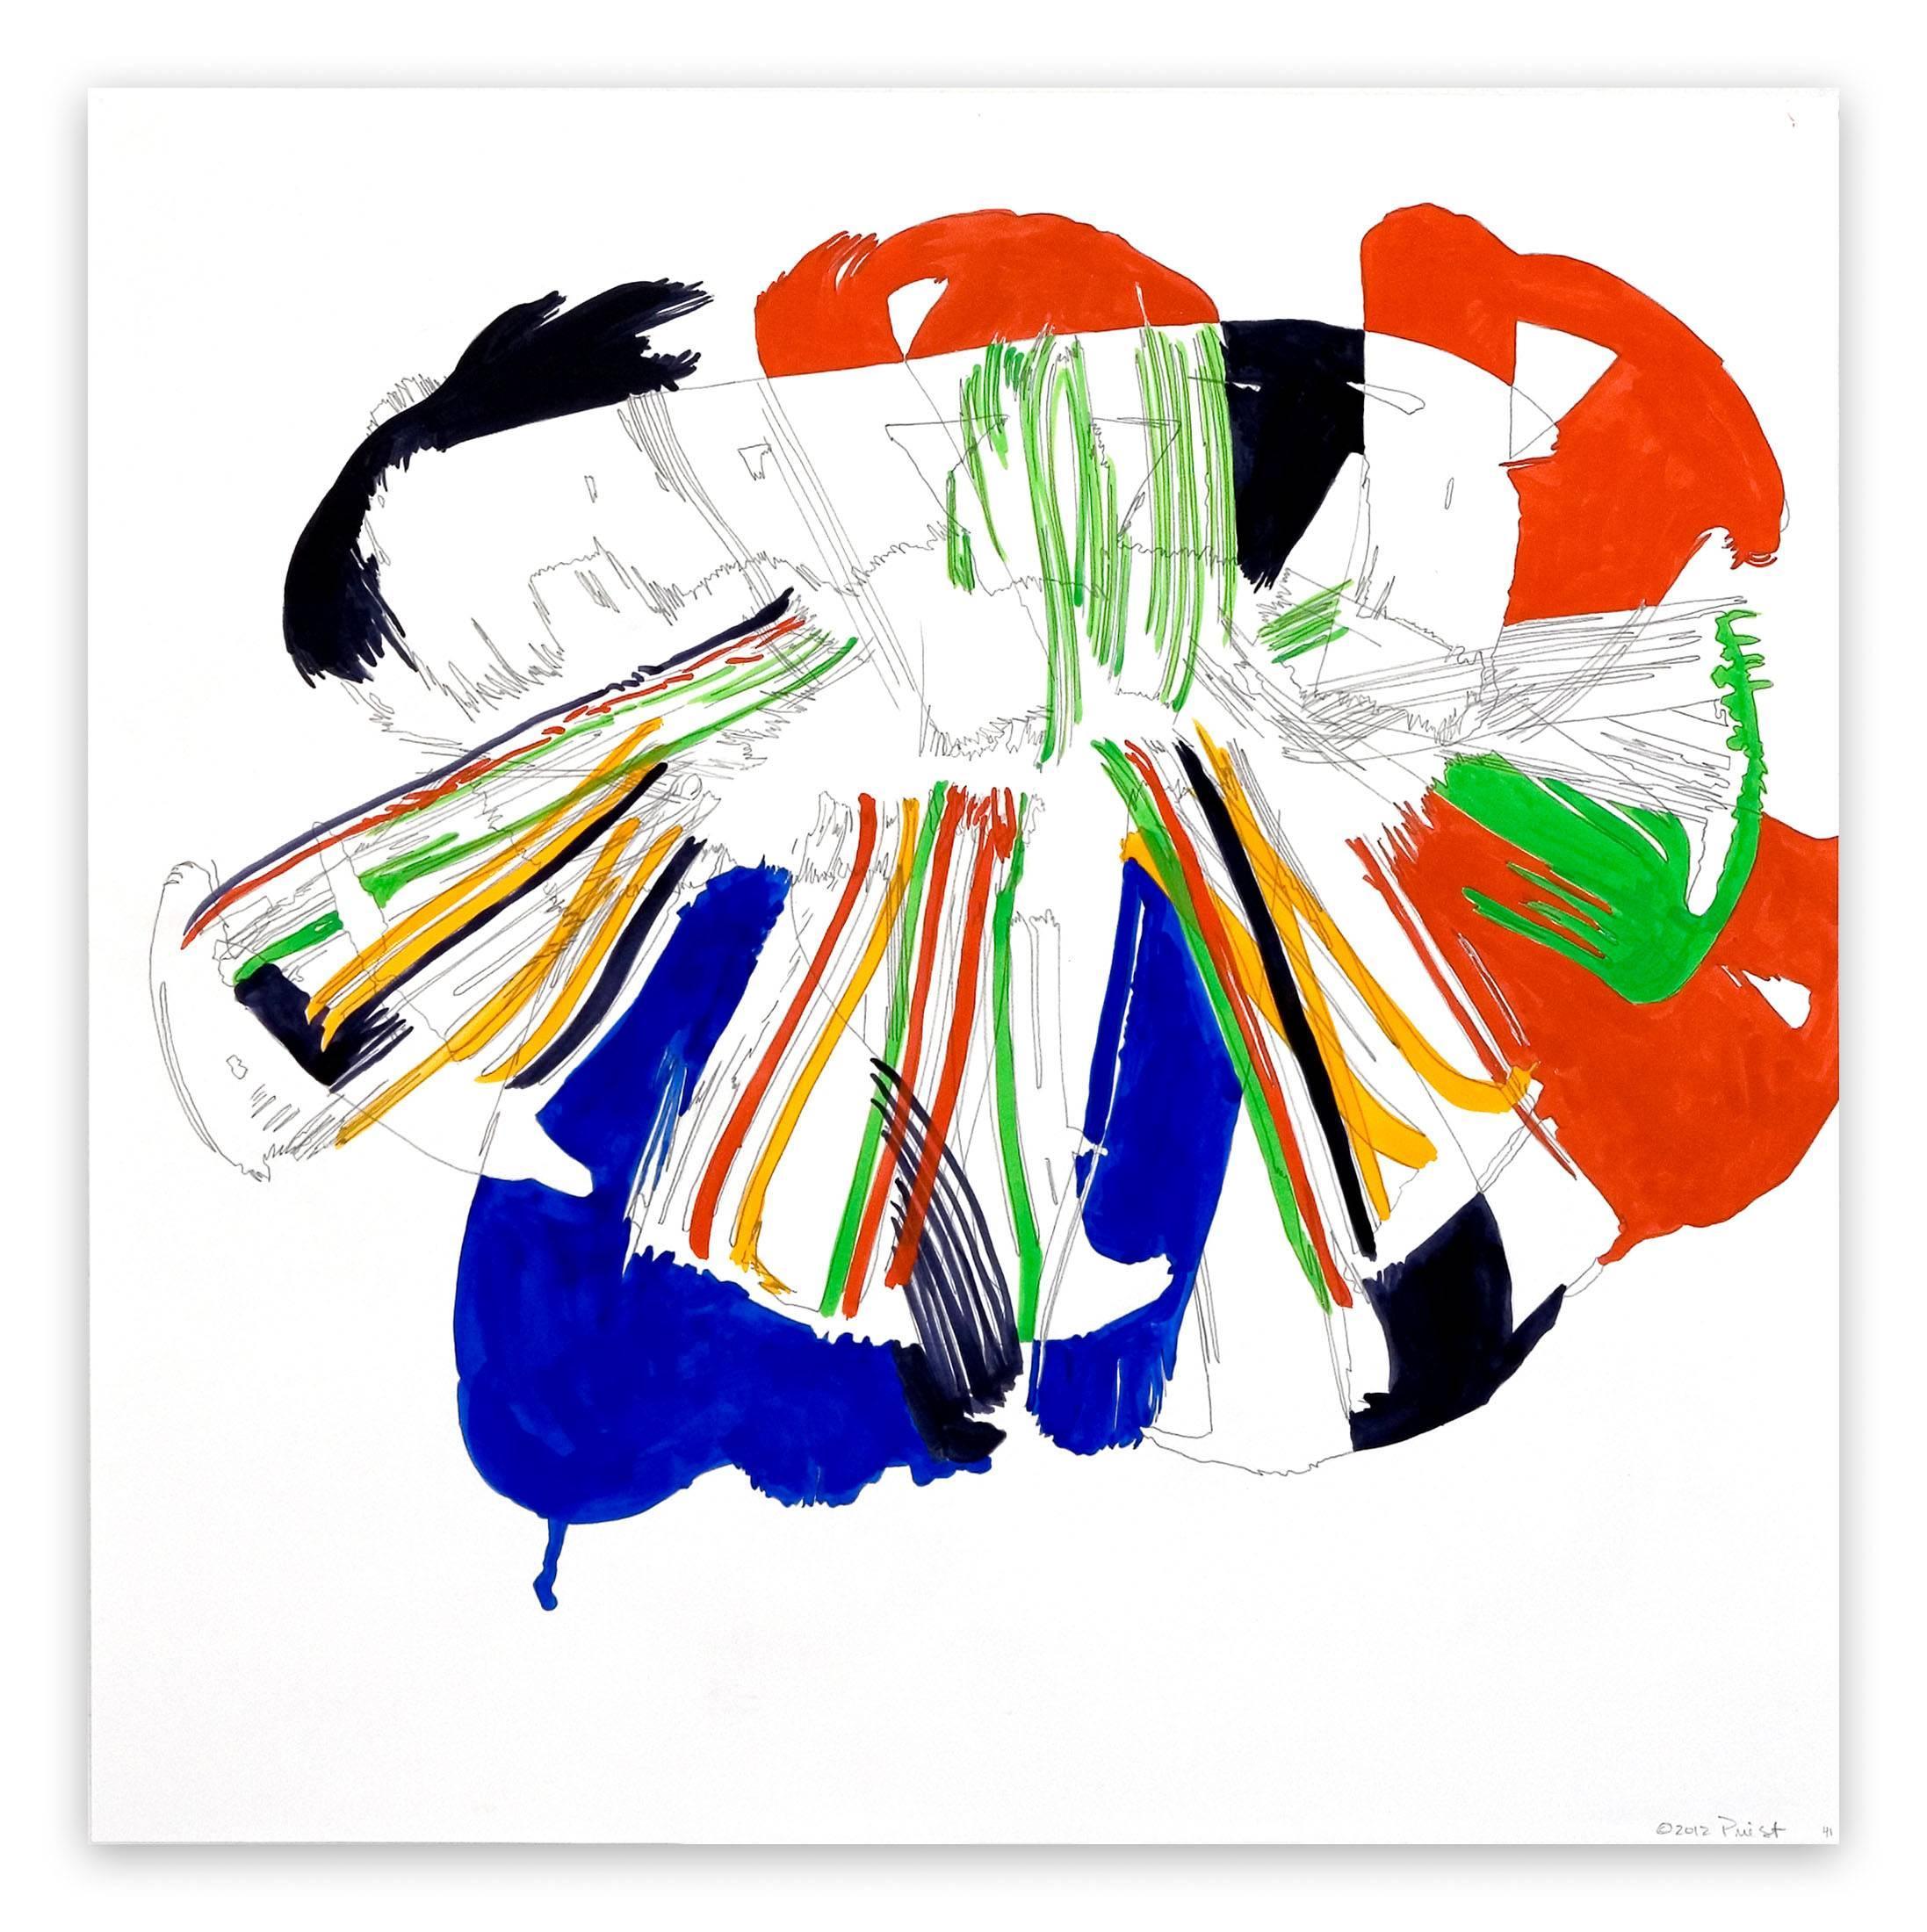 Jazz Cubano #41: Percussion Drawing (Abstract painting)